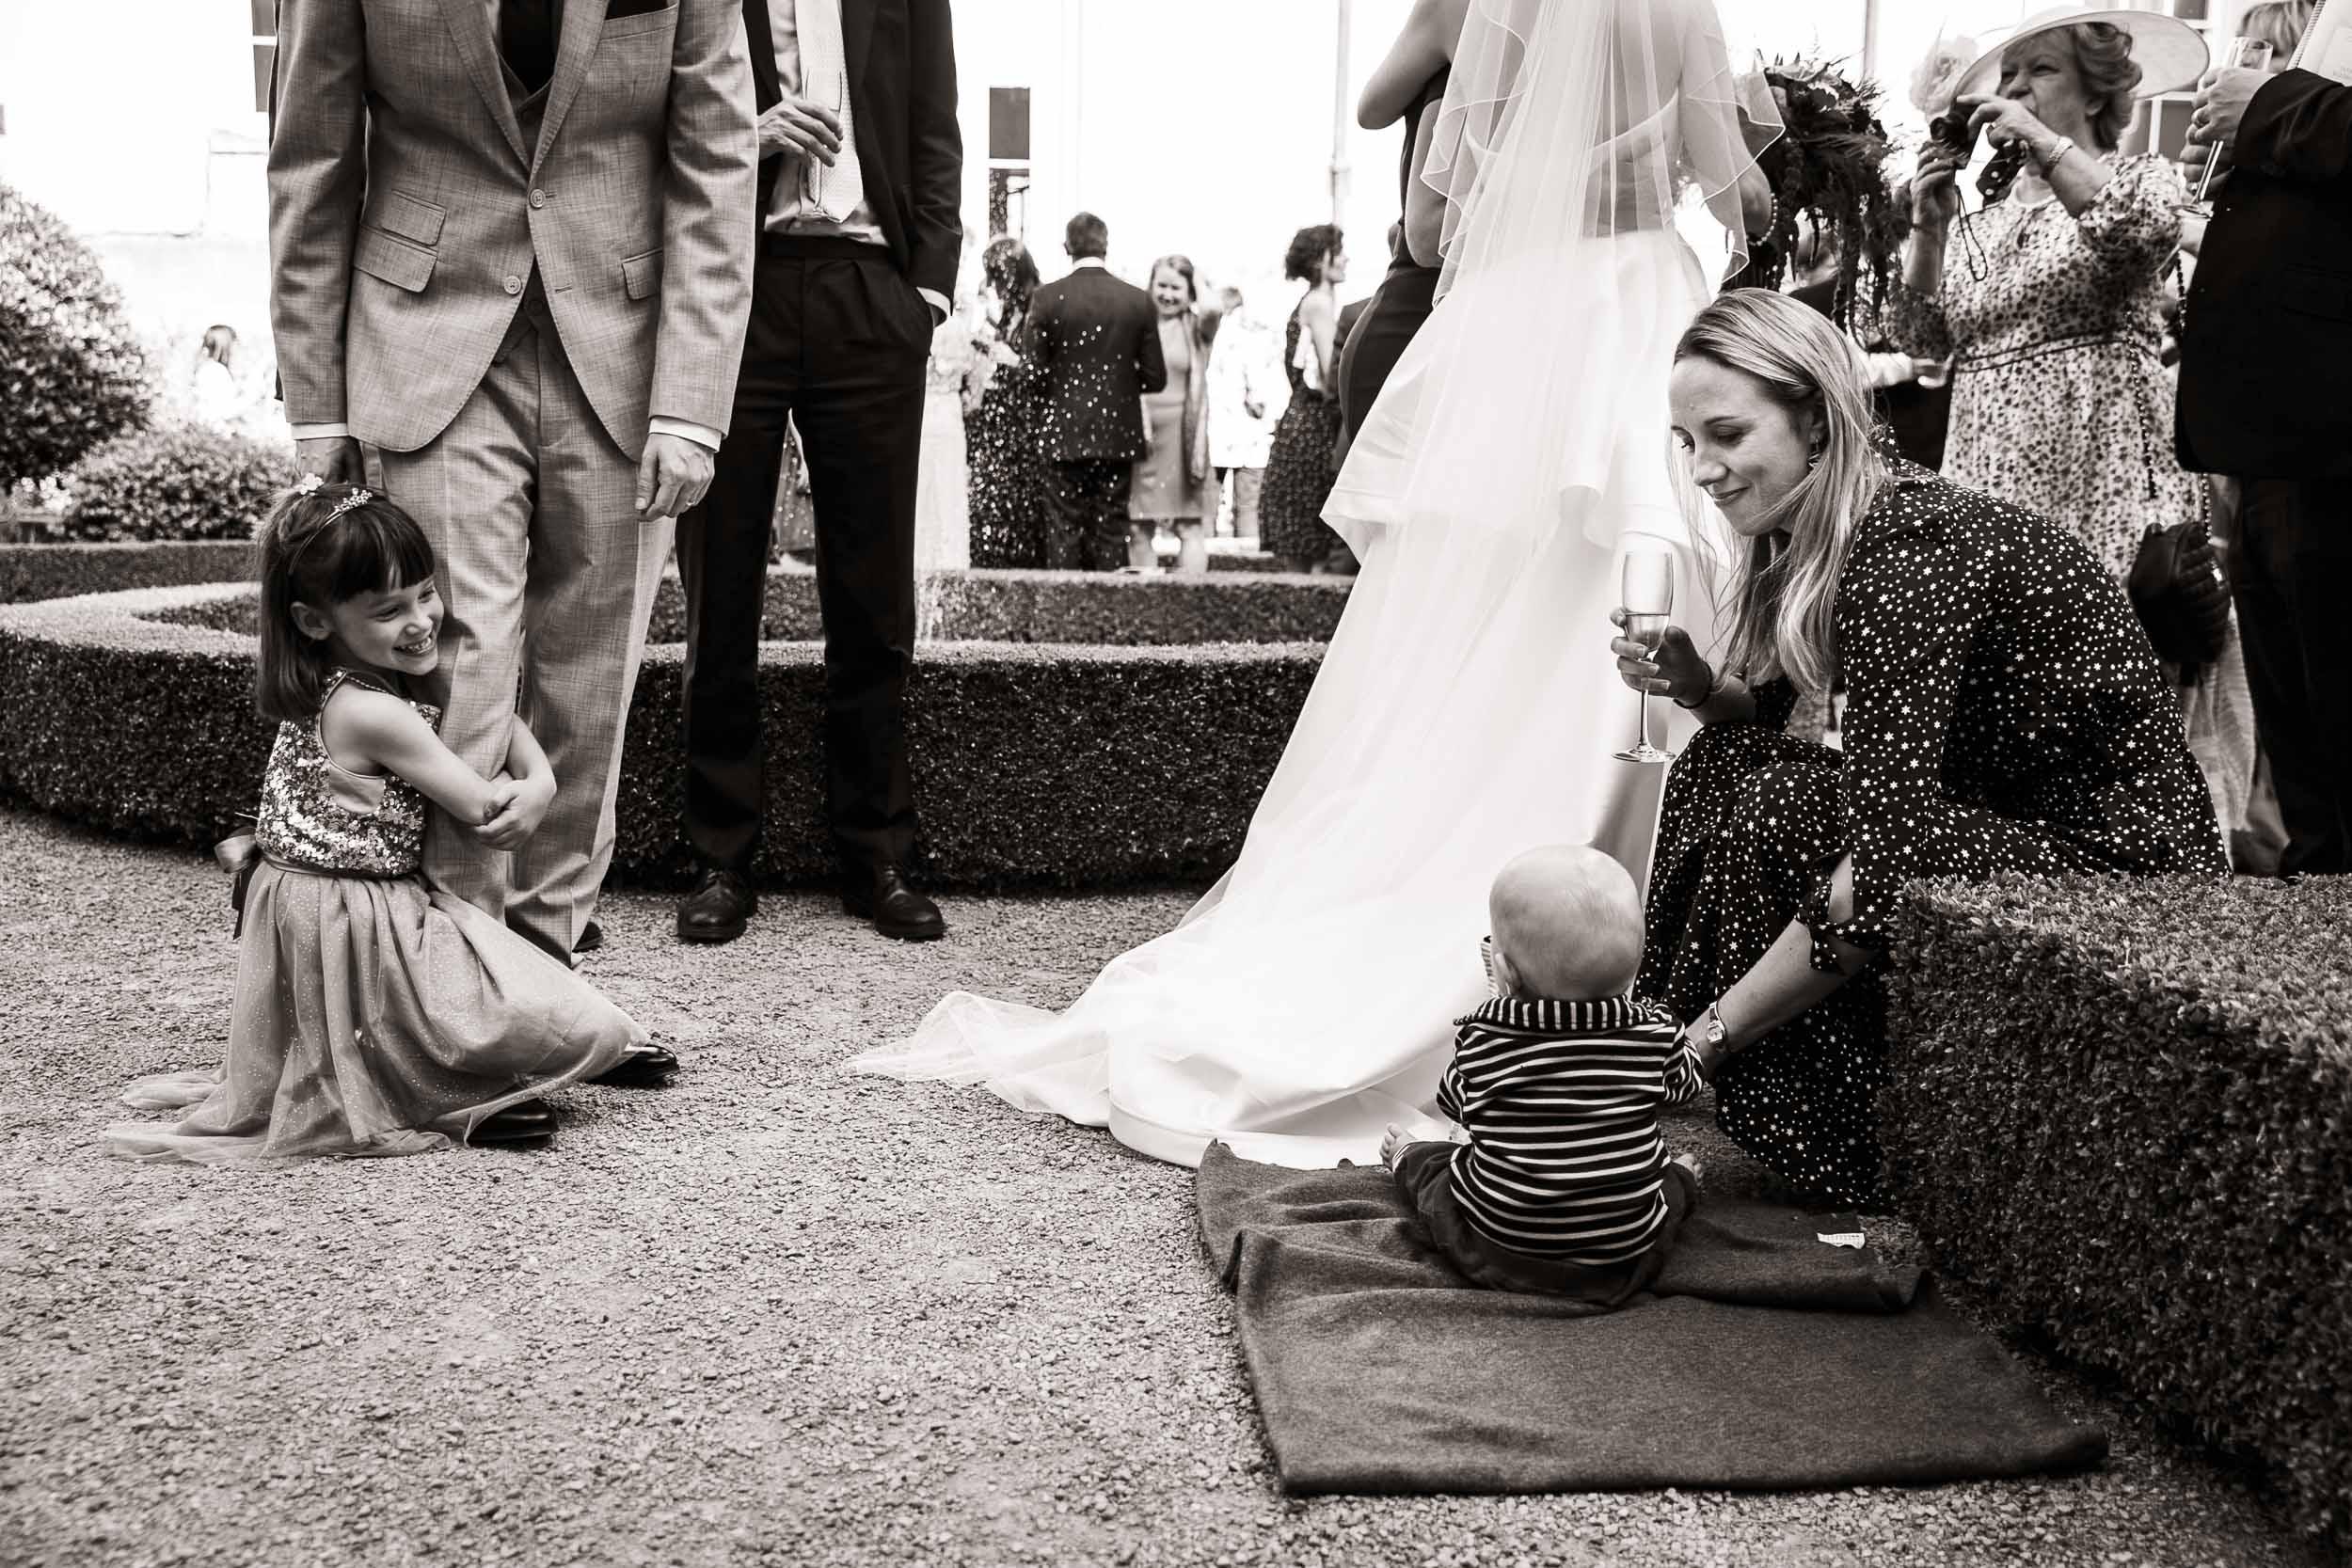 syon-house-wedding-photographer-london 094.jpg